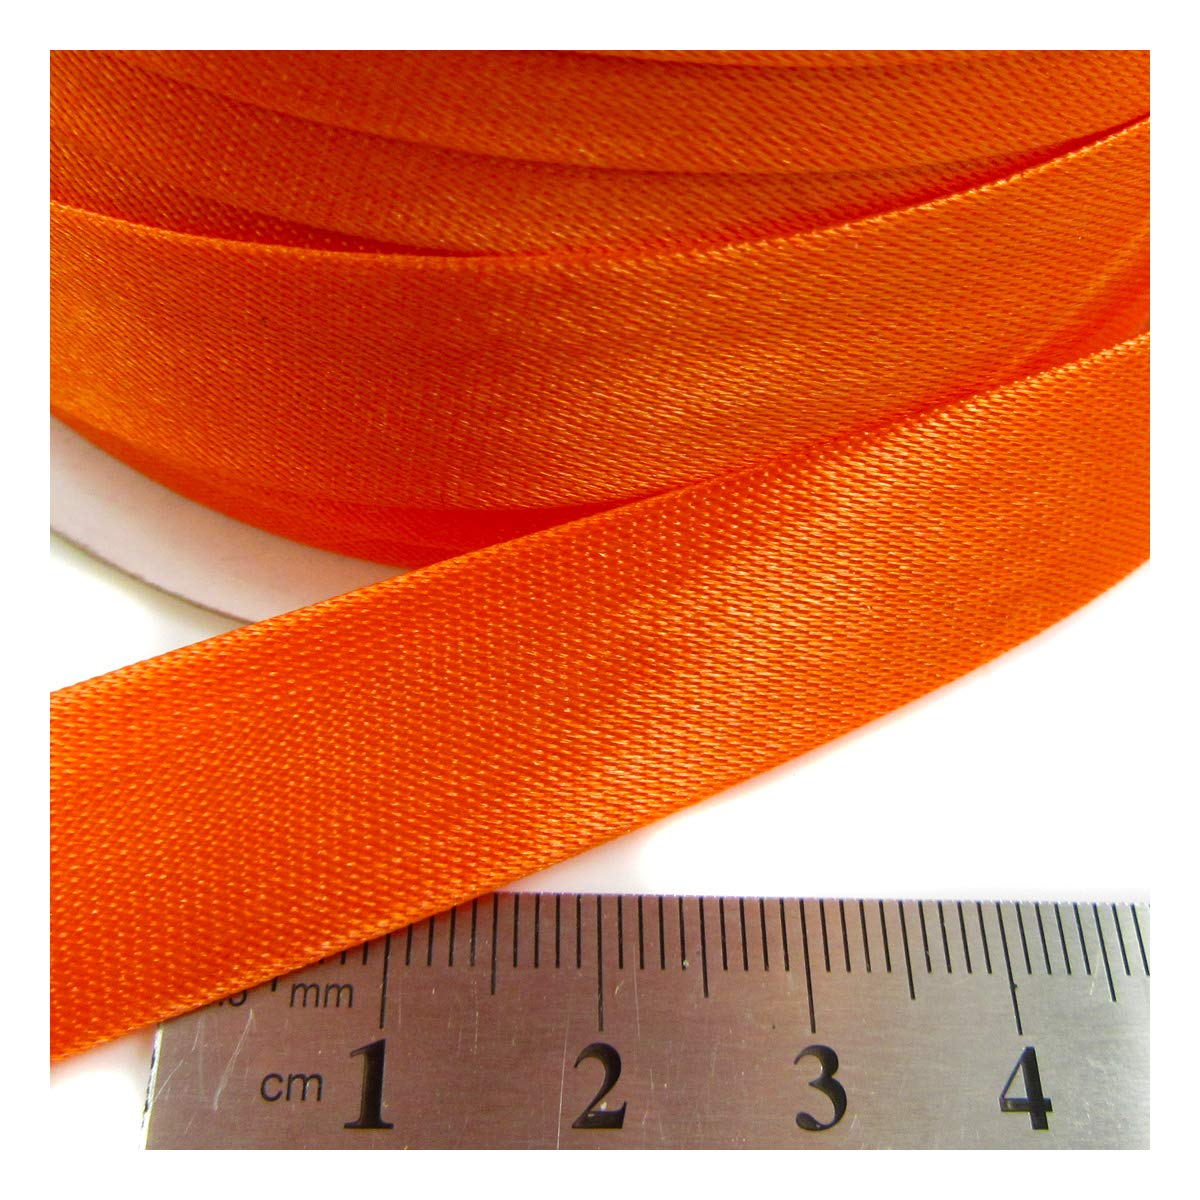 KRAFTZ® Herringbone Cotton Tape 20mm 25m Roll for Craft Bunting